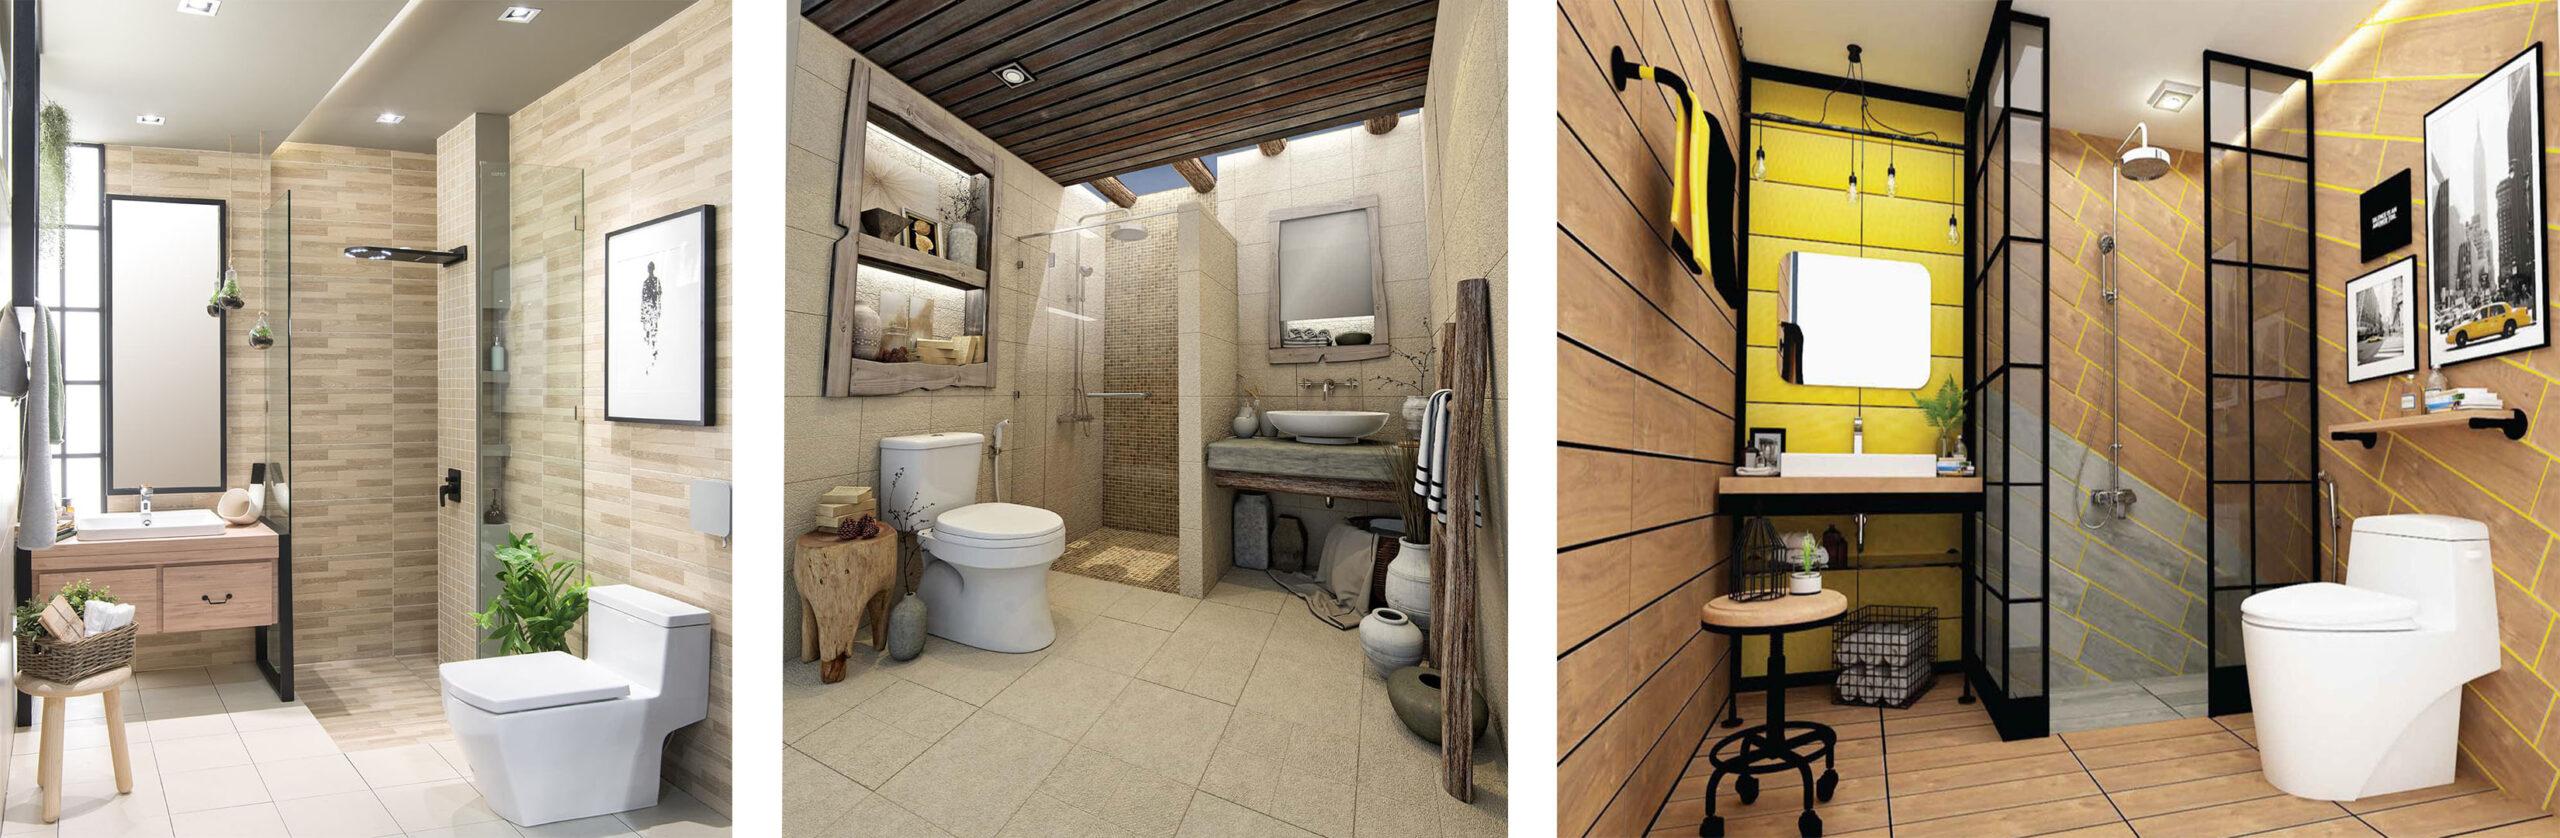 Small bathroom decorate 3 series